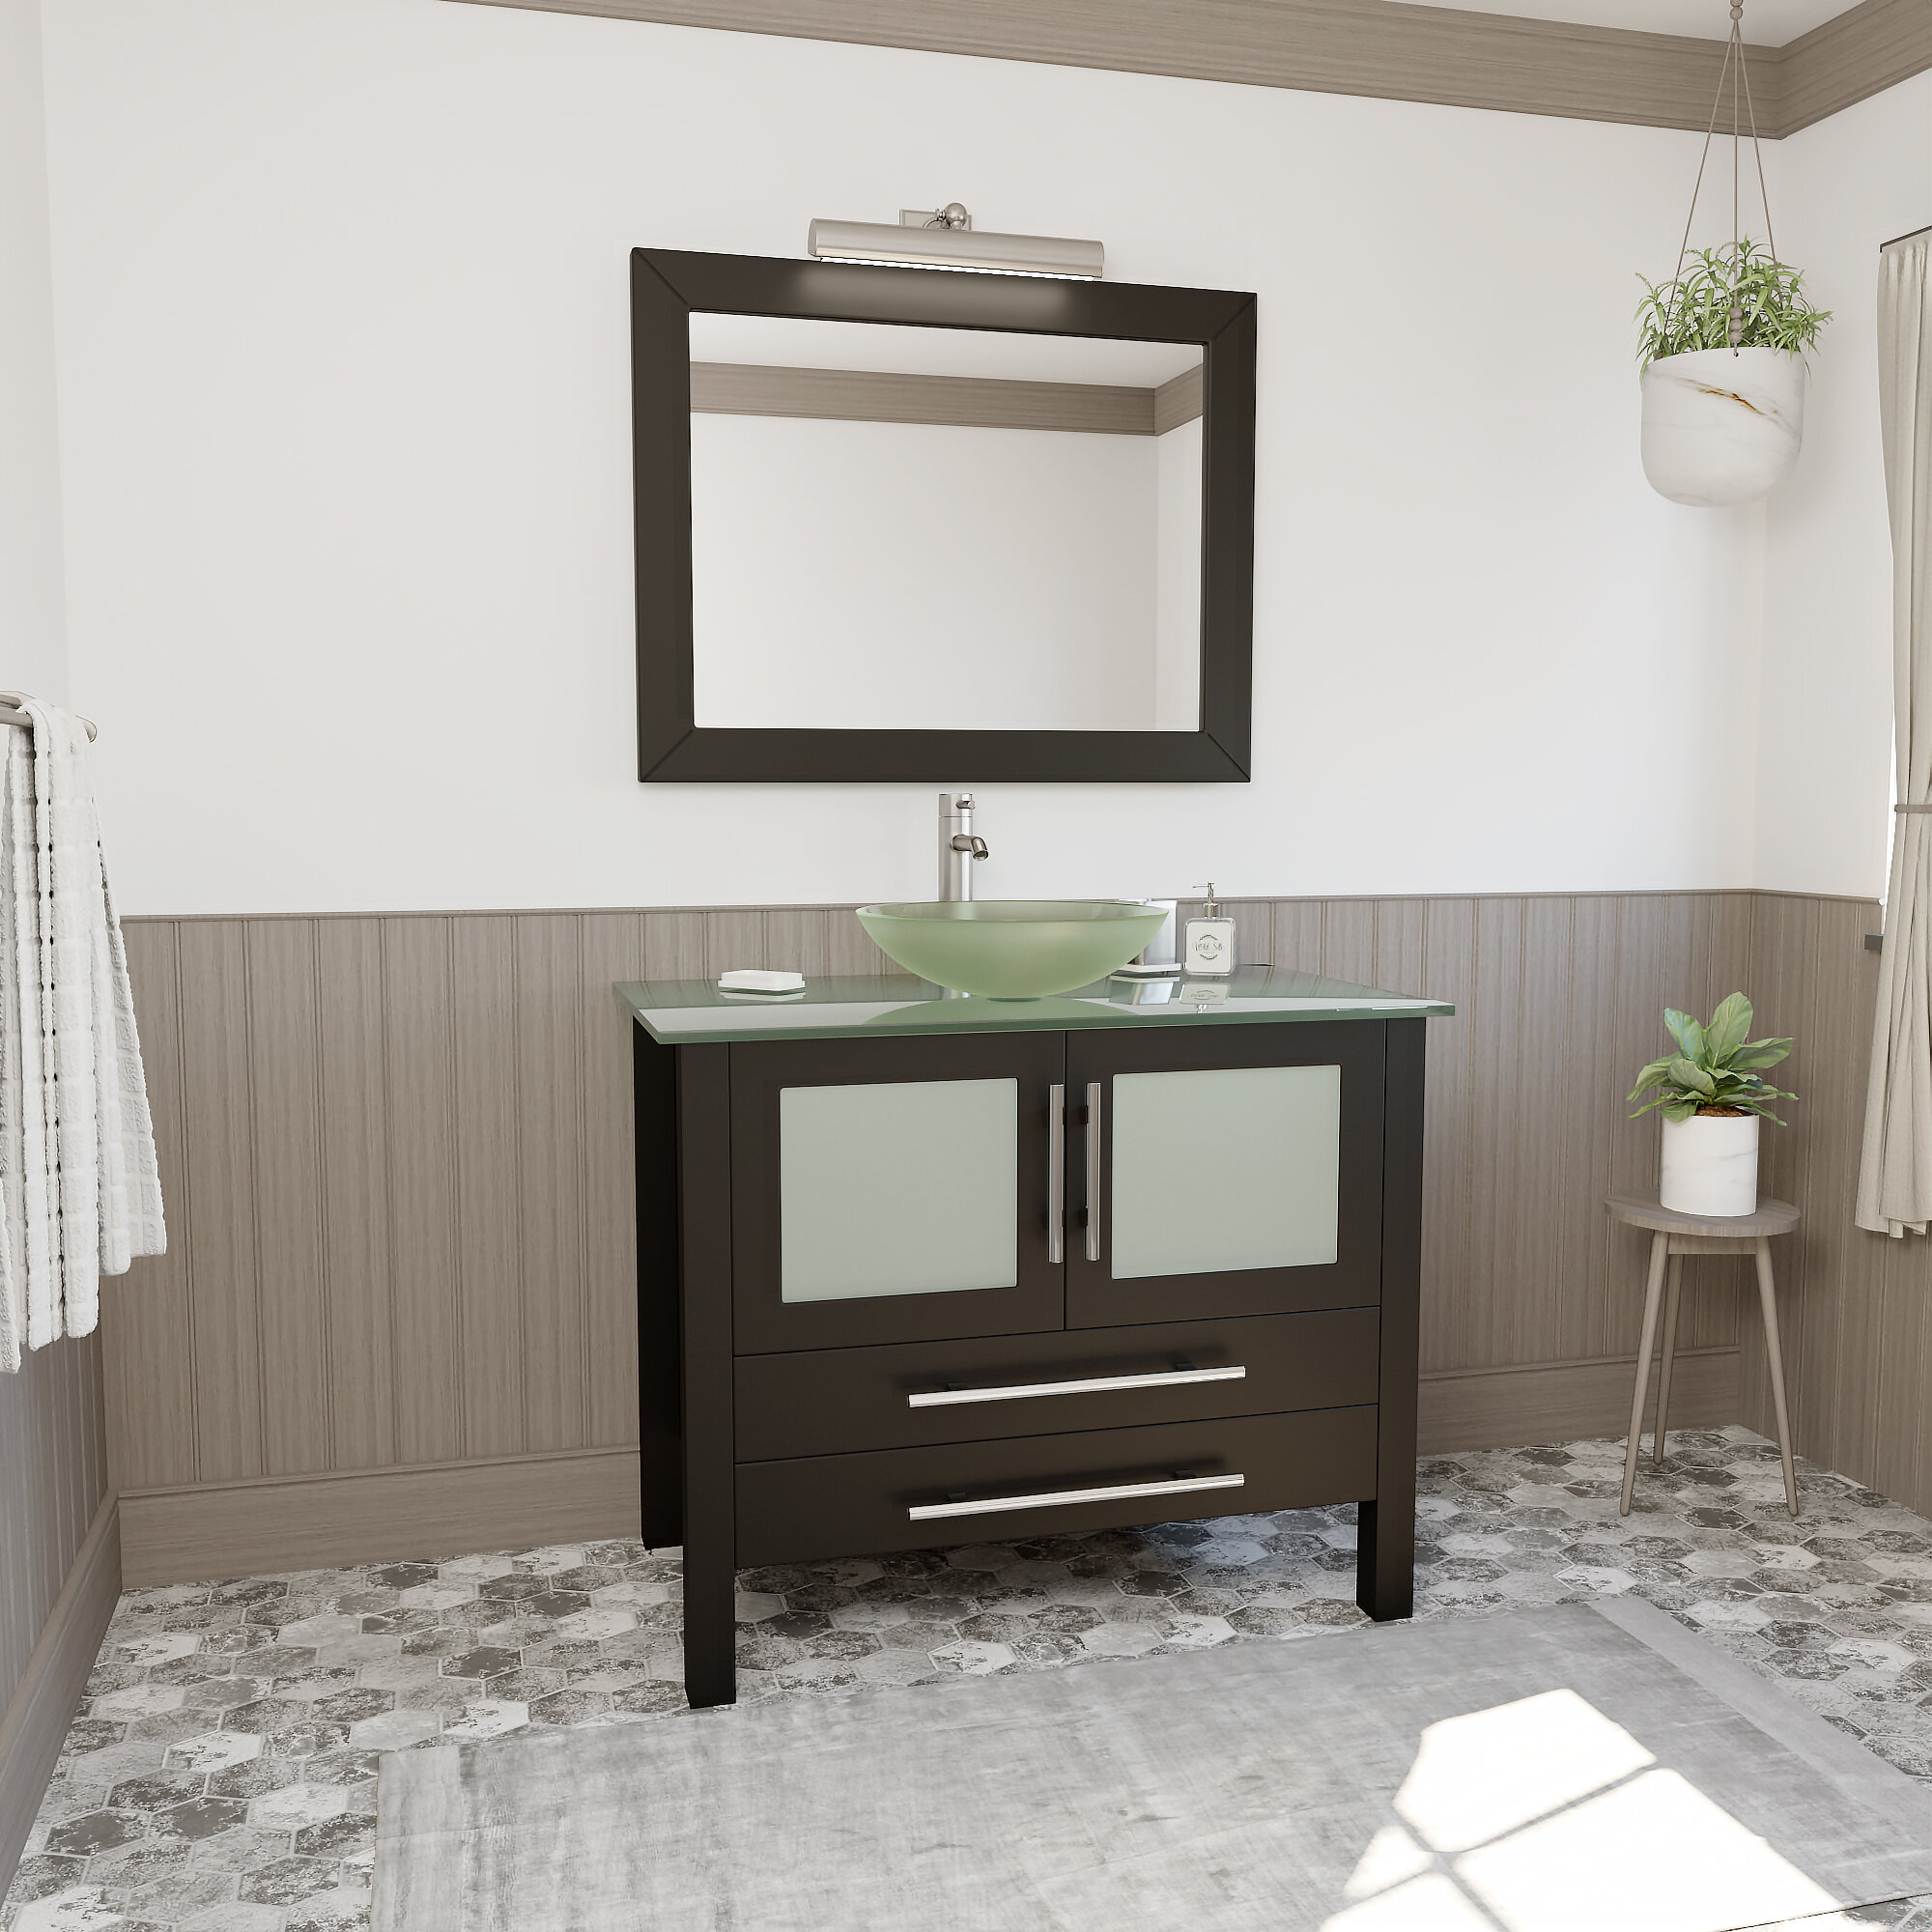 Brayden Studio Meserve Solid Wood Glass Vessel 36 Single Bathroom Vanity Set With Mirror Reviews Wayfair